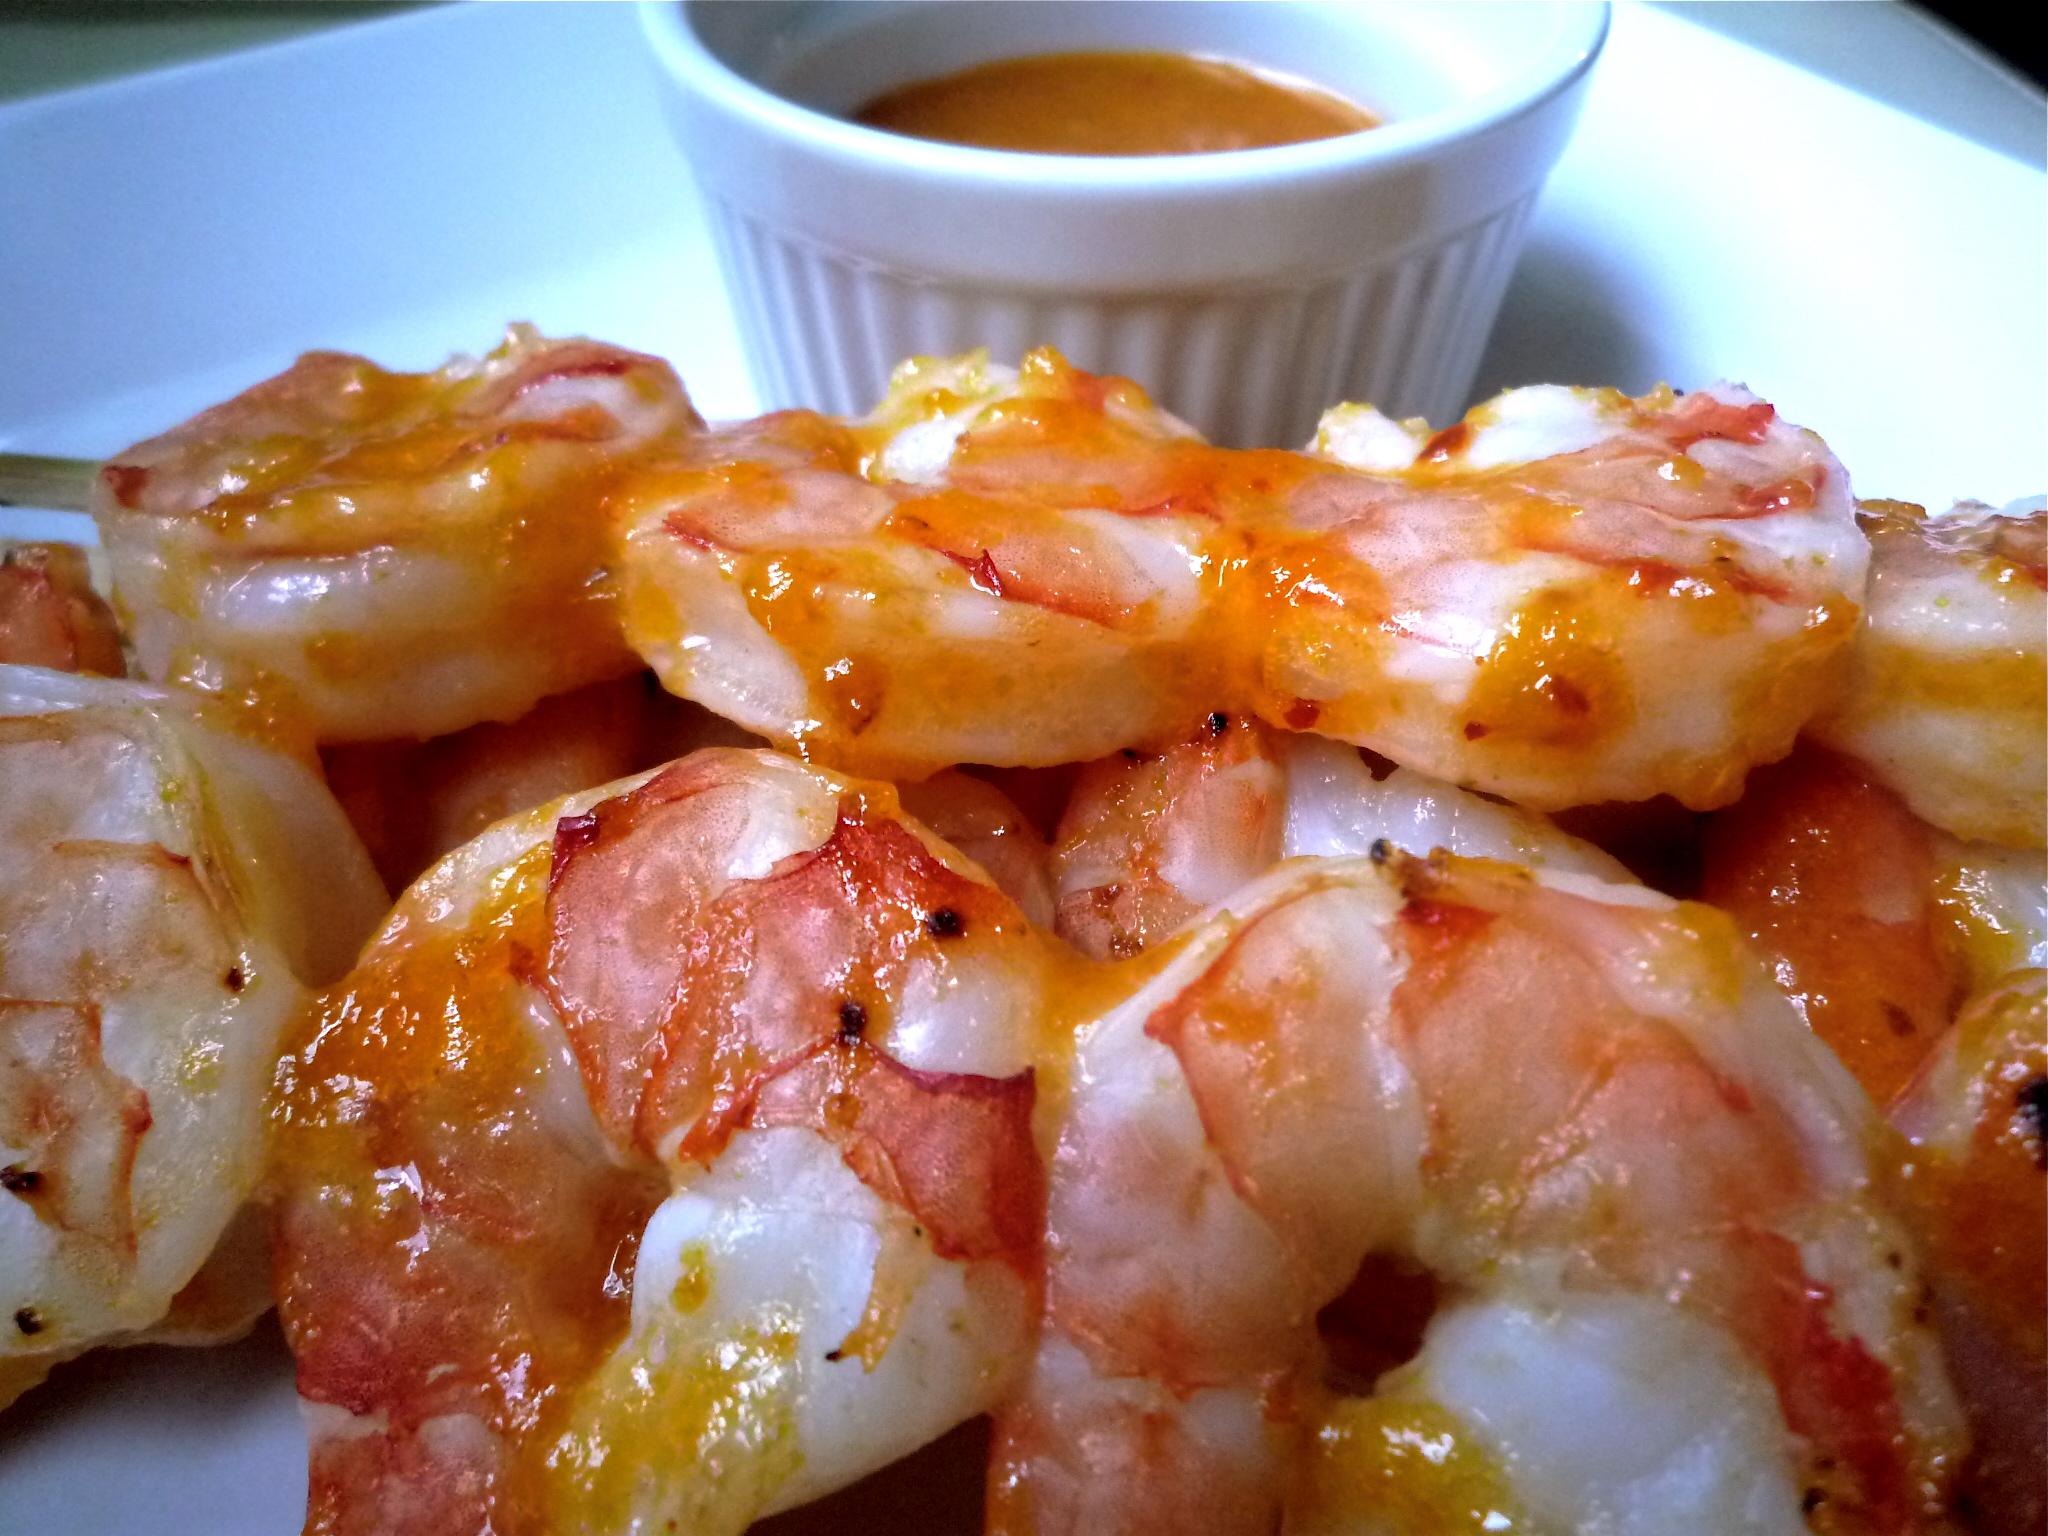 Spicy Apricot Glazed Grilled Shrimp